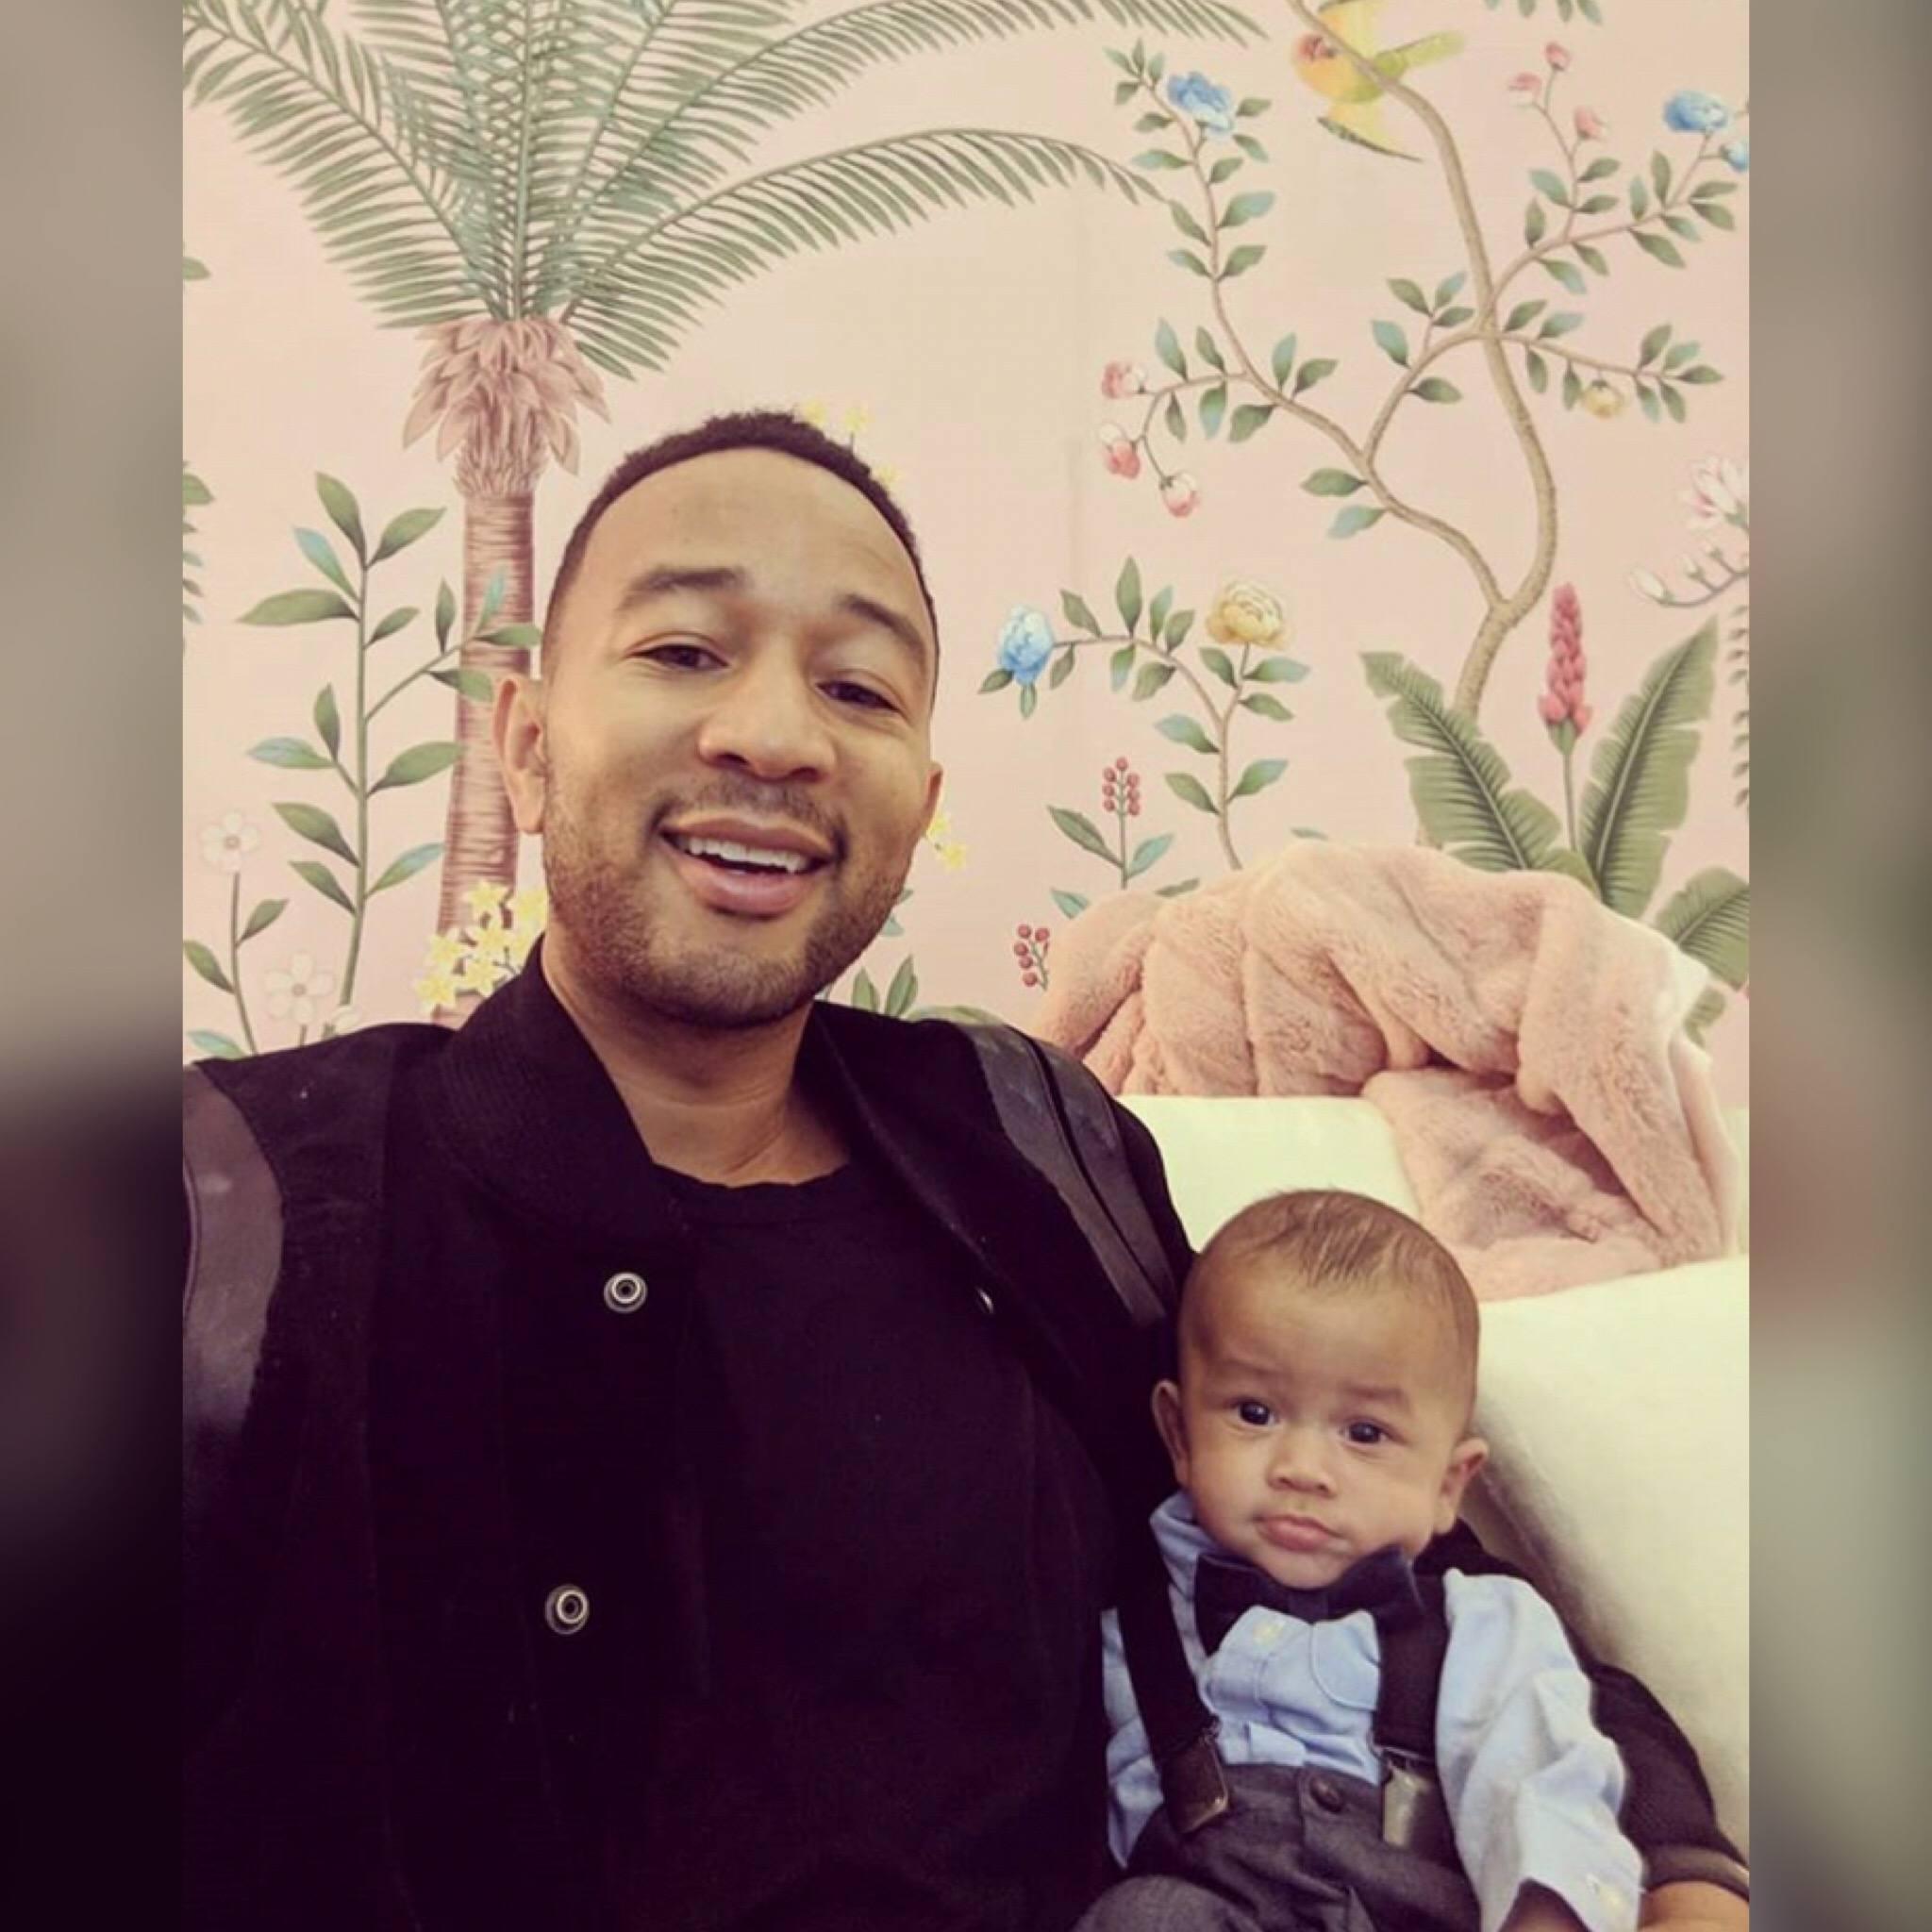 John Lengend & His Baby Boy Miles